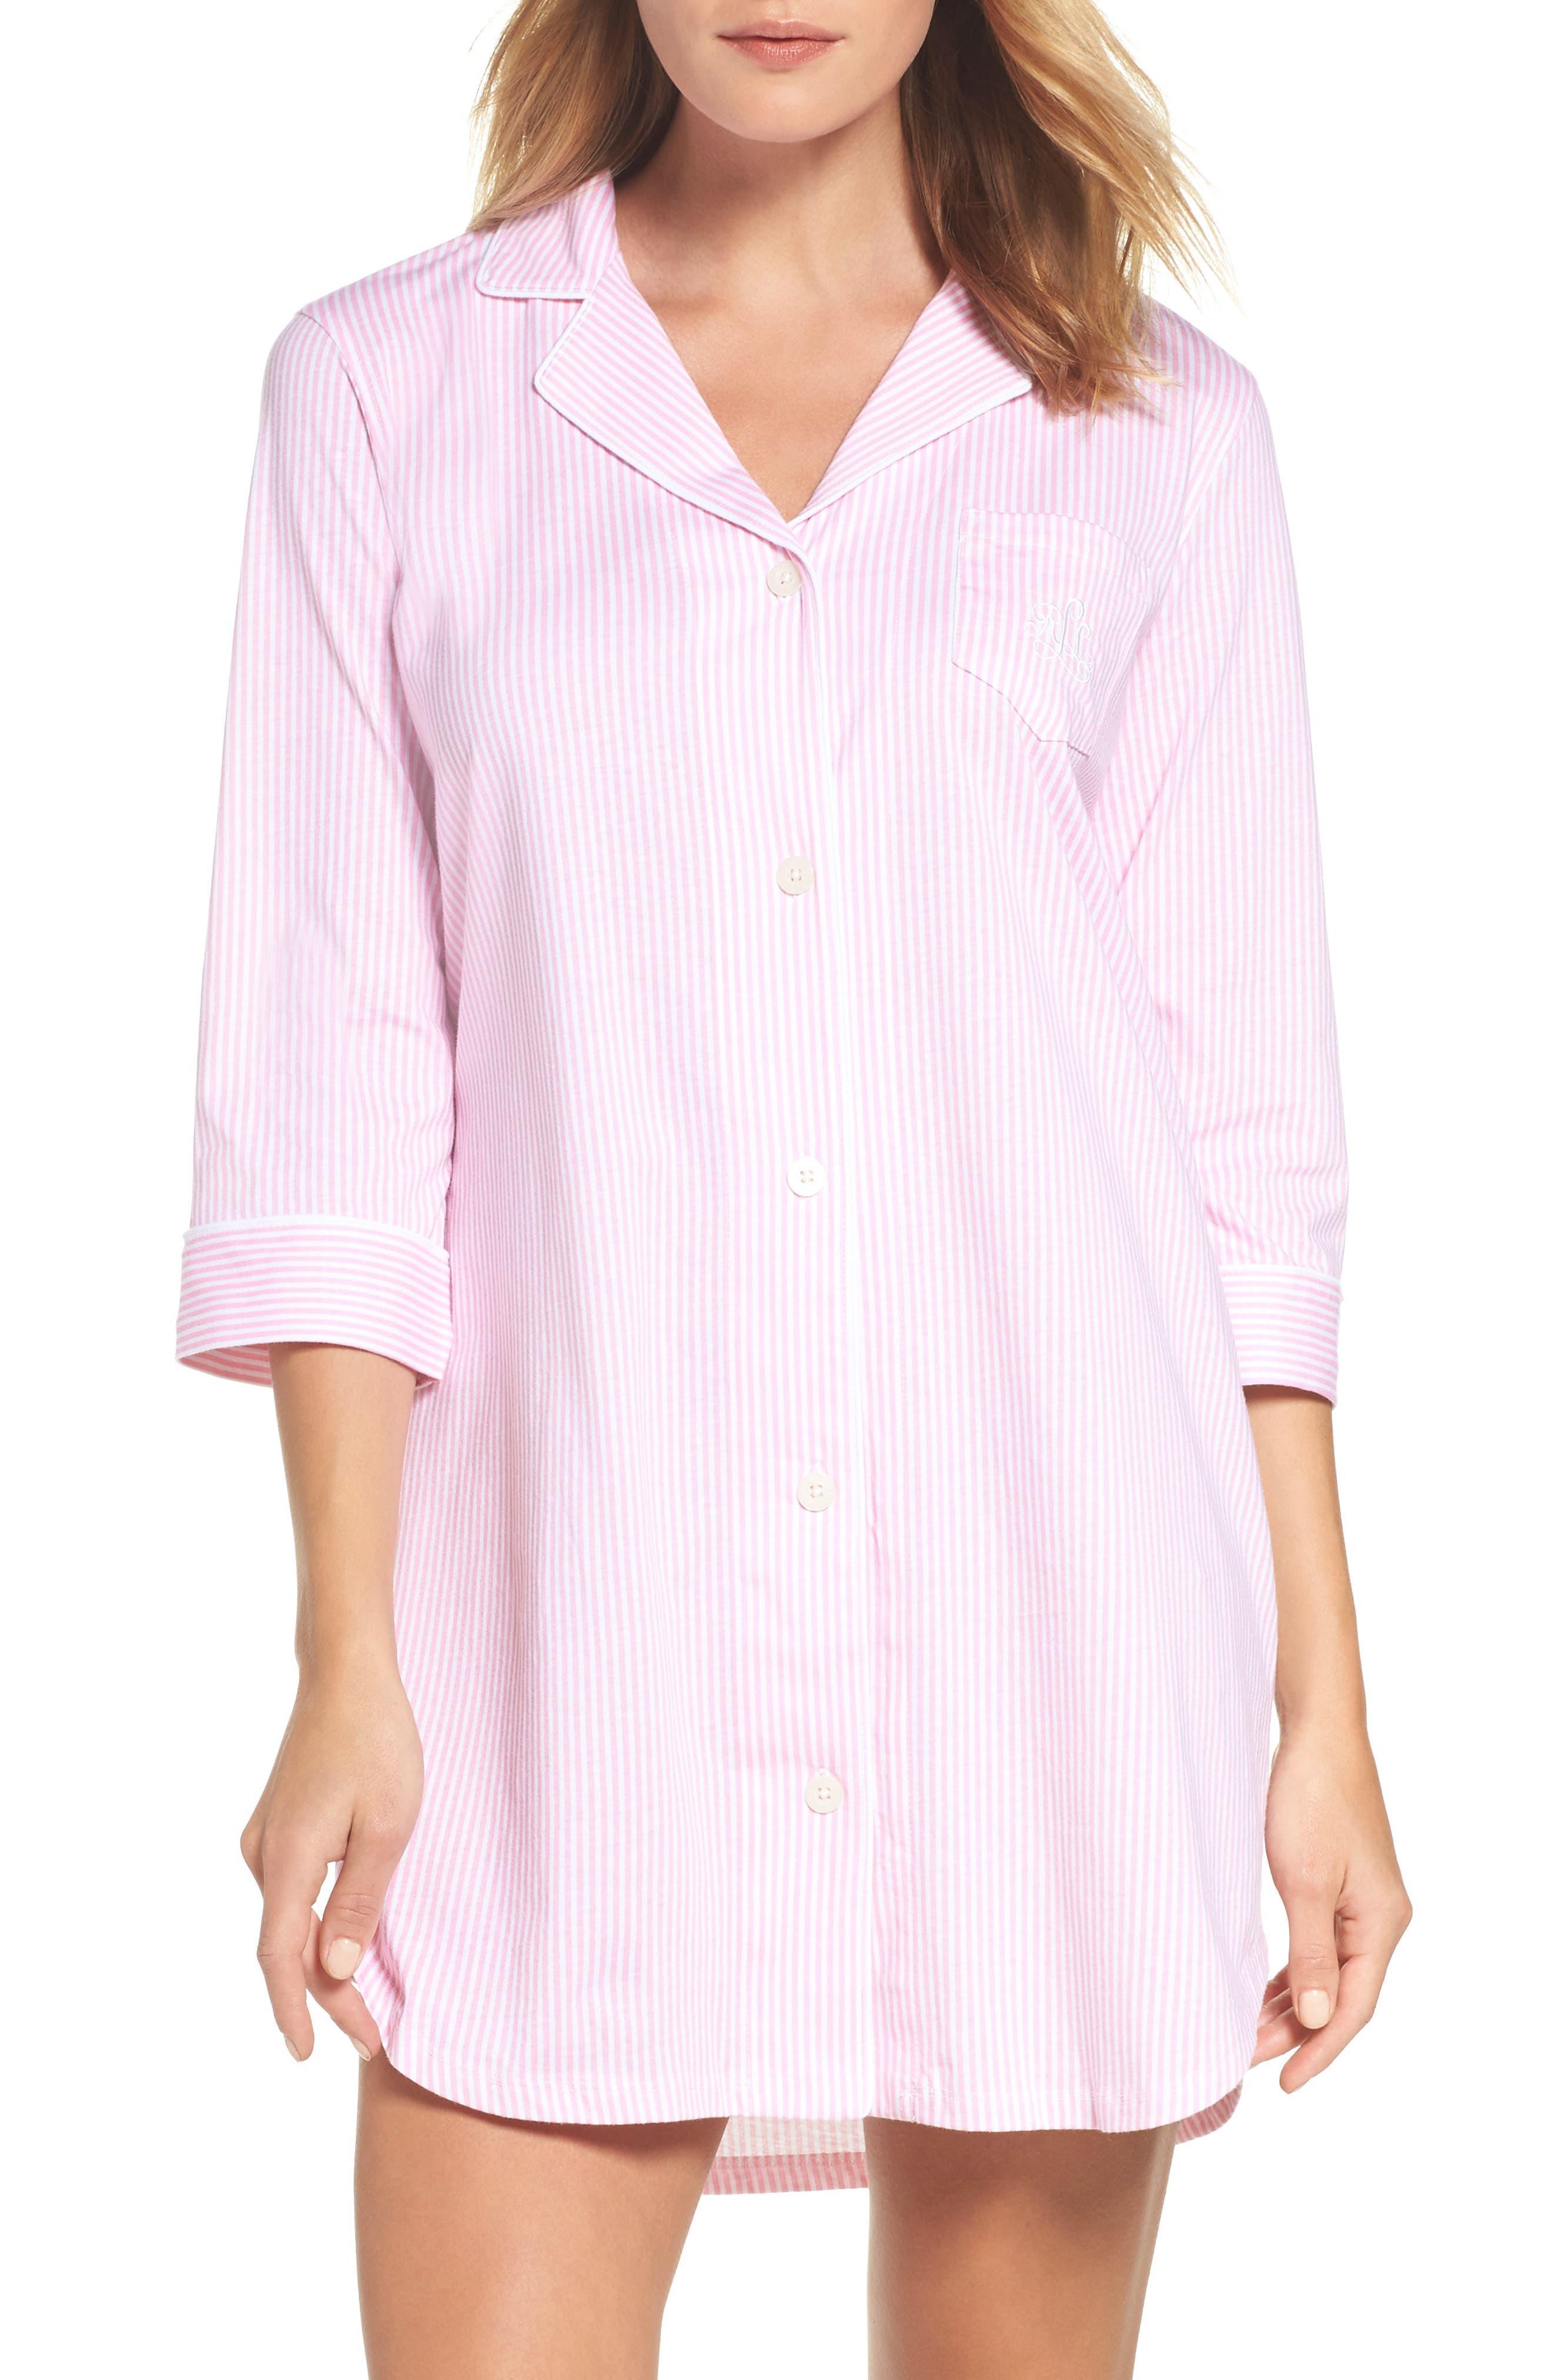 Jersey Sleep Shirt,                             Alternate thumbnail 12, color,